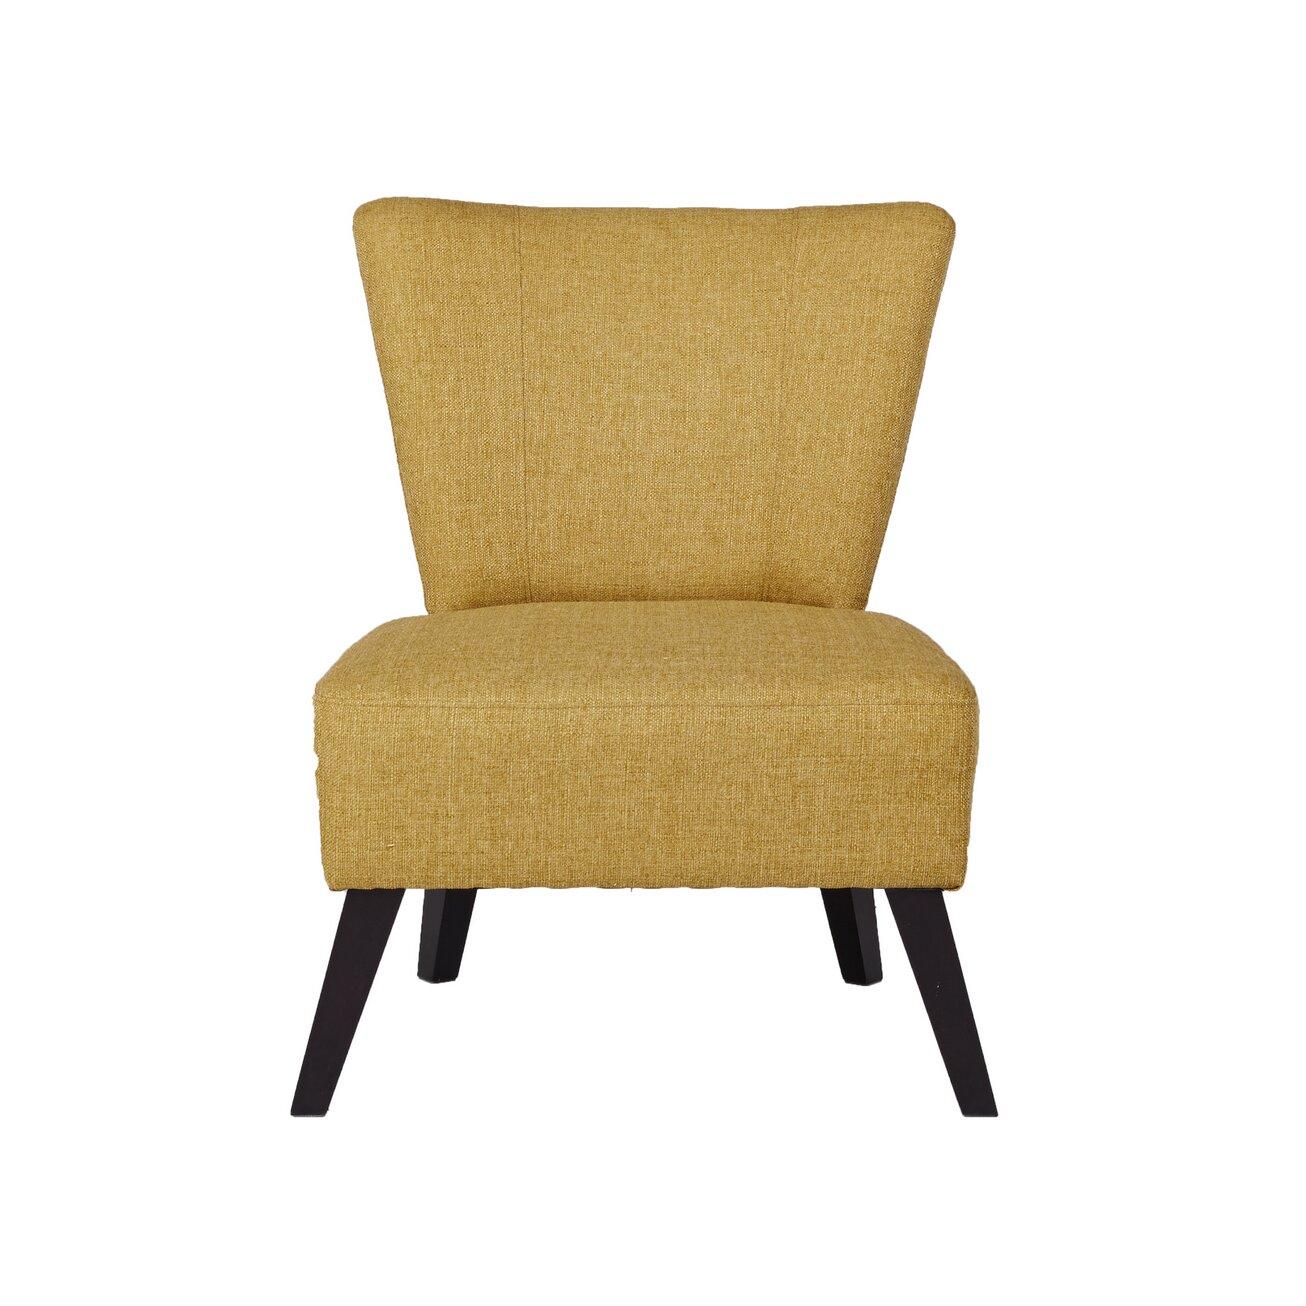 Kaleidoscope furniture malaga slipper chair reviews wayfair - Furniture malaga ...